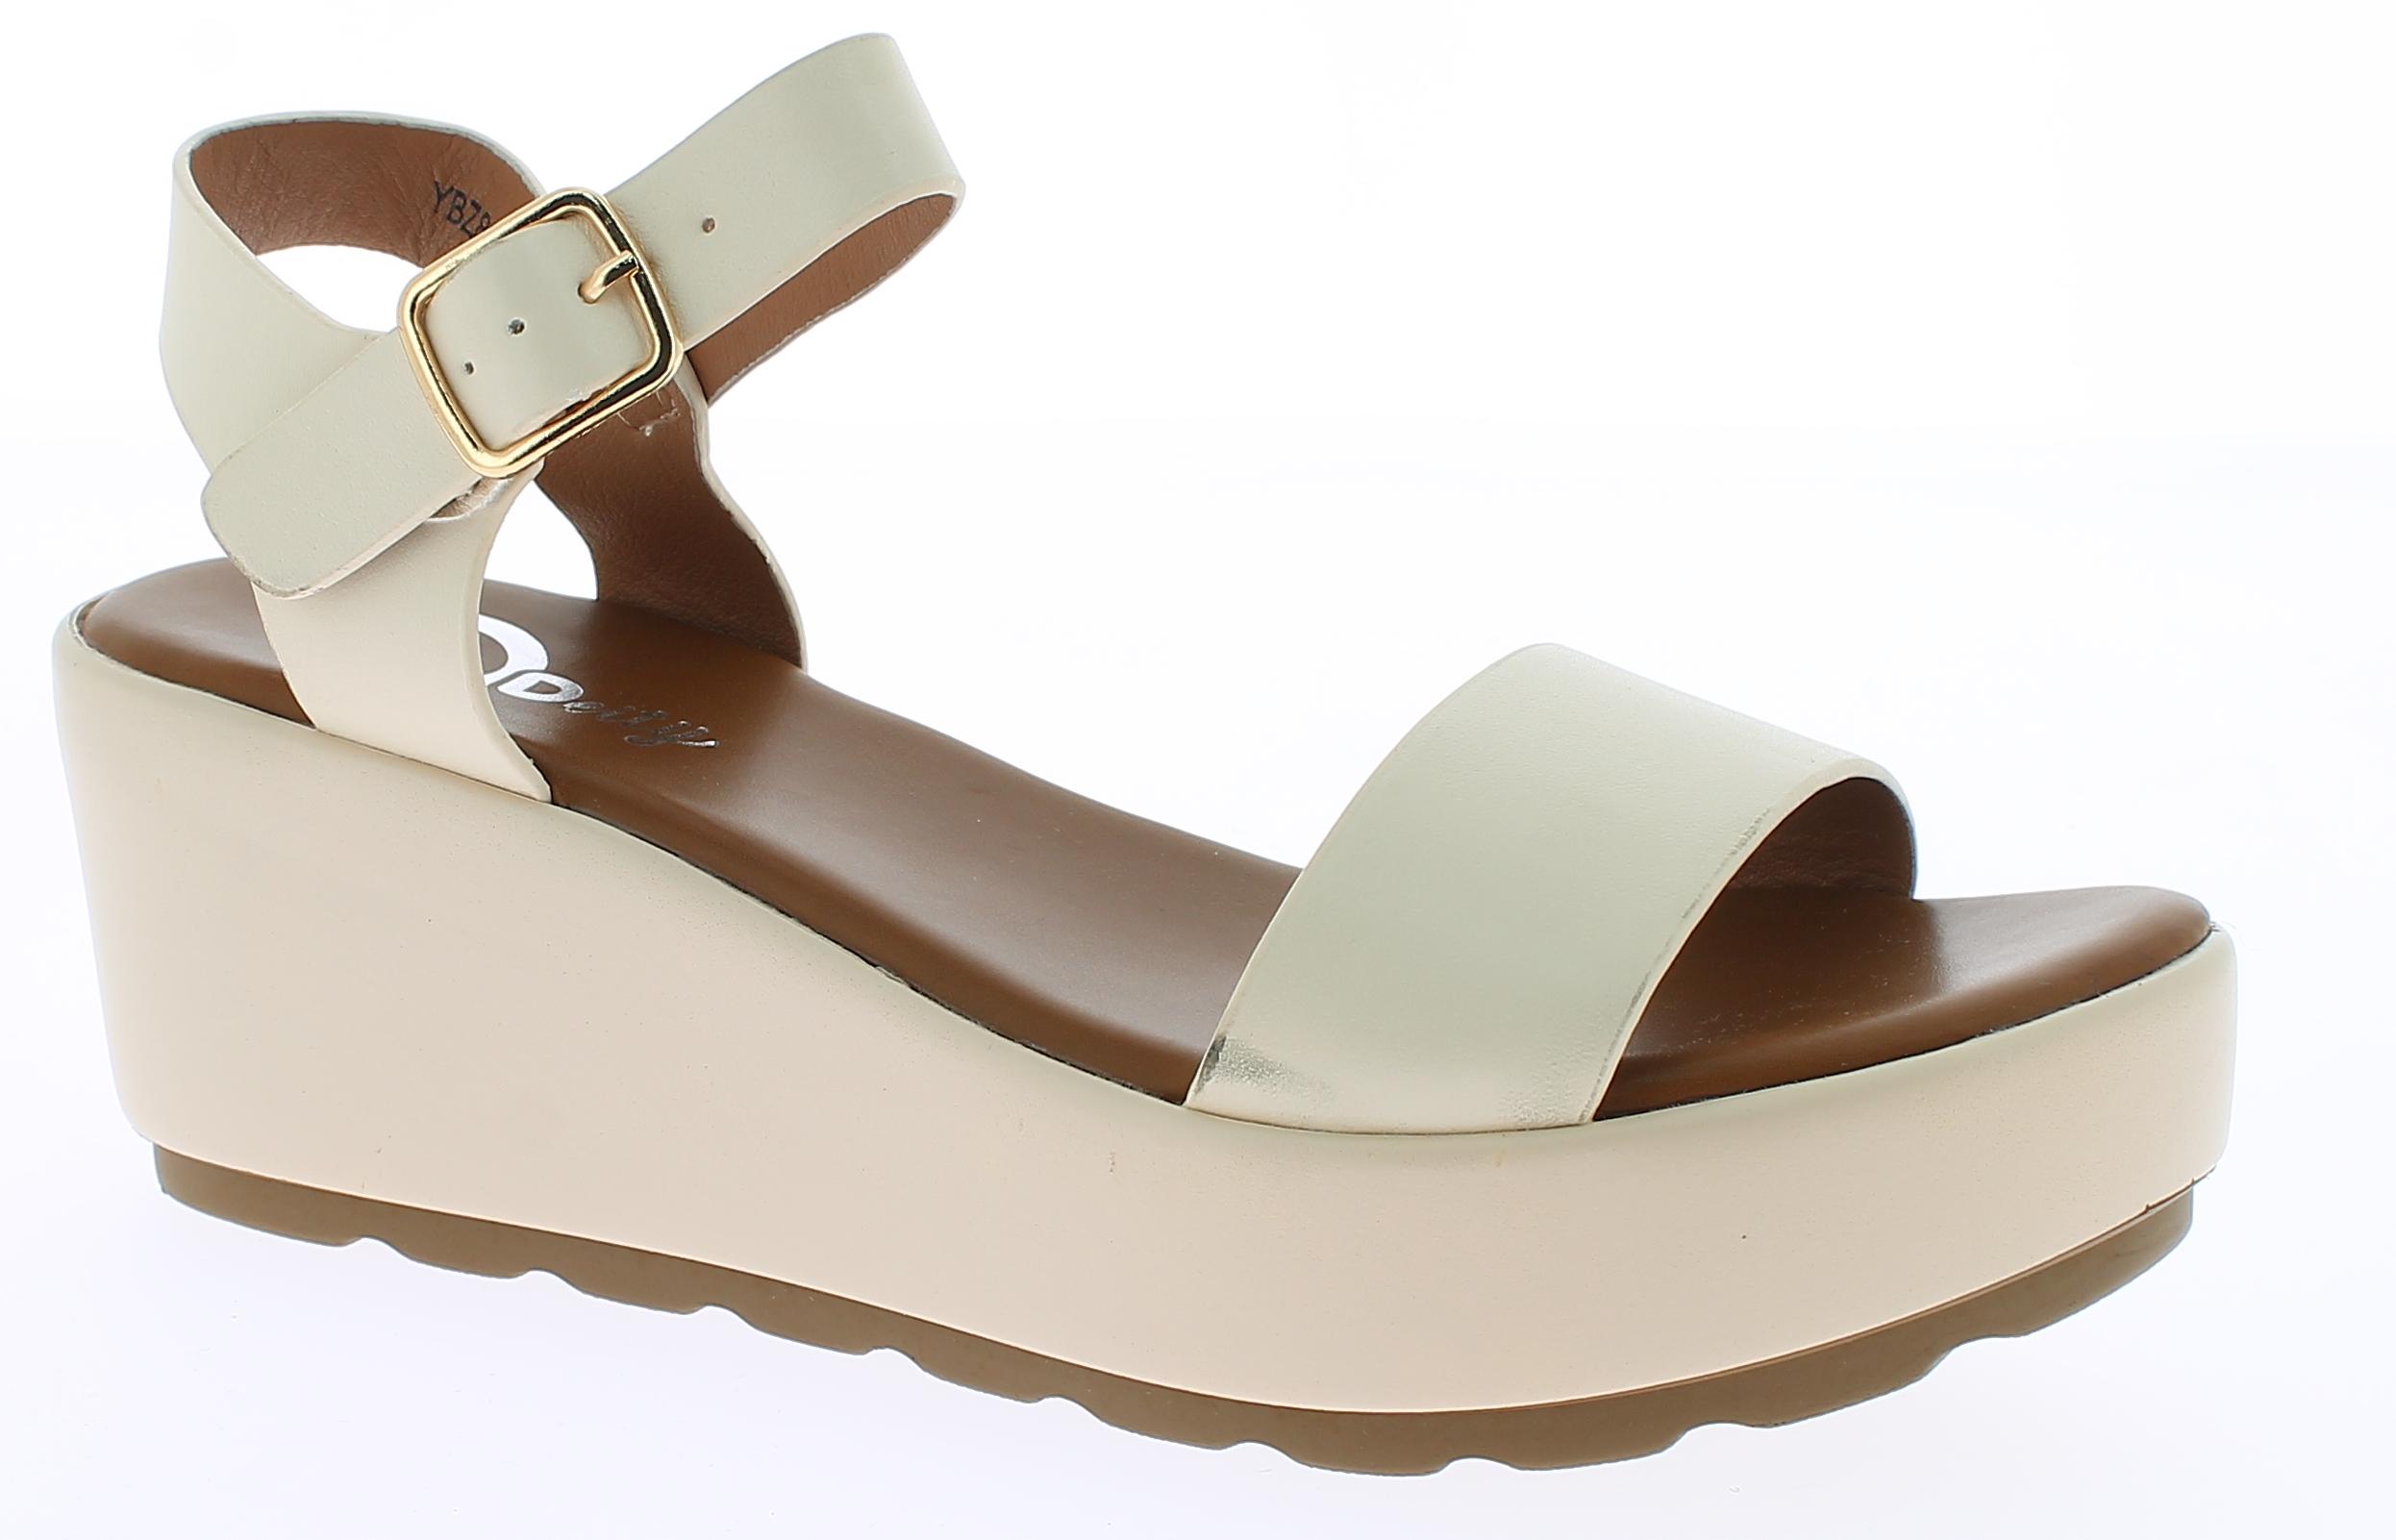 BALLERI Γυναικείο Πέδιλο YBZ8273 Μπέζ - IqShoes - YBZ8273 BEIGE-beige-39/1/7/25 παπούτσια  πέδιλα